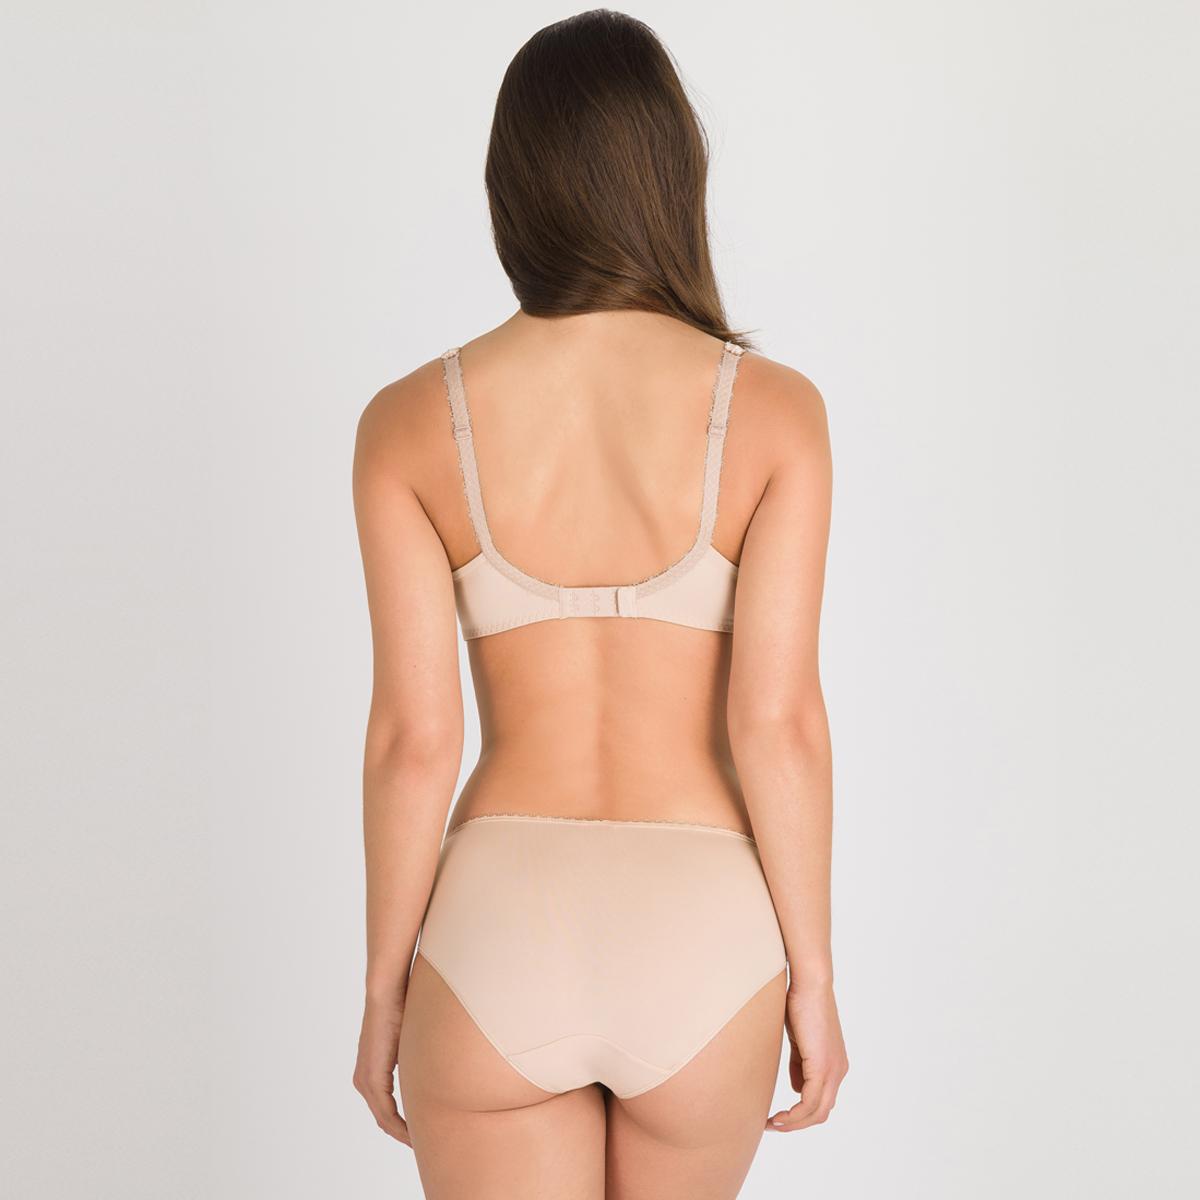 Reggiseno coppa spacer beige - Flowery Lace, , PLAYTEX